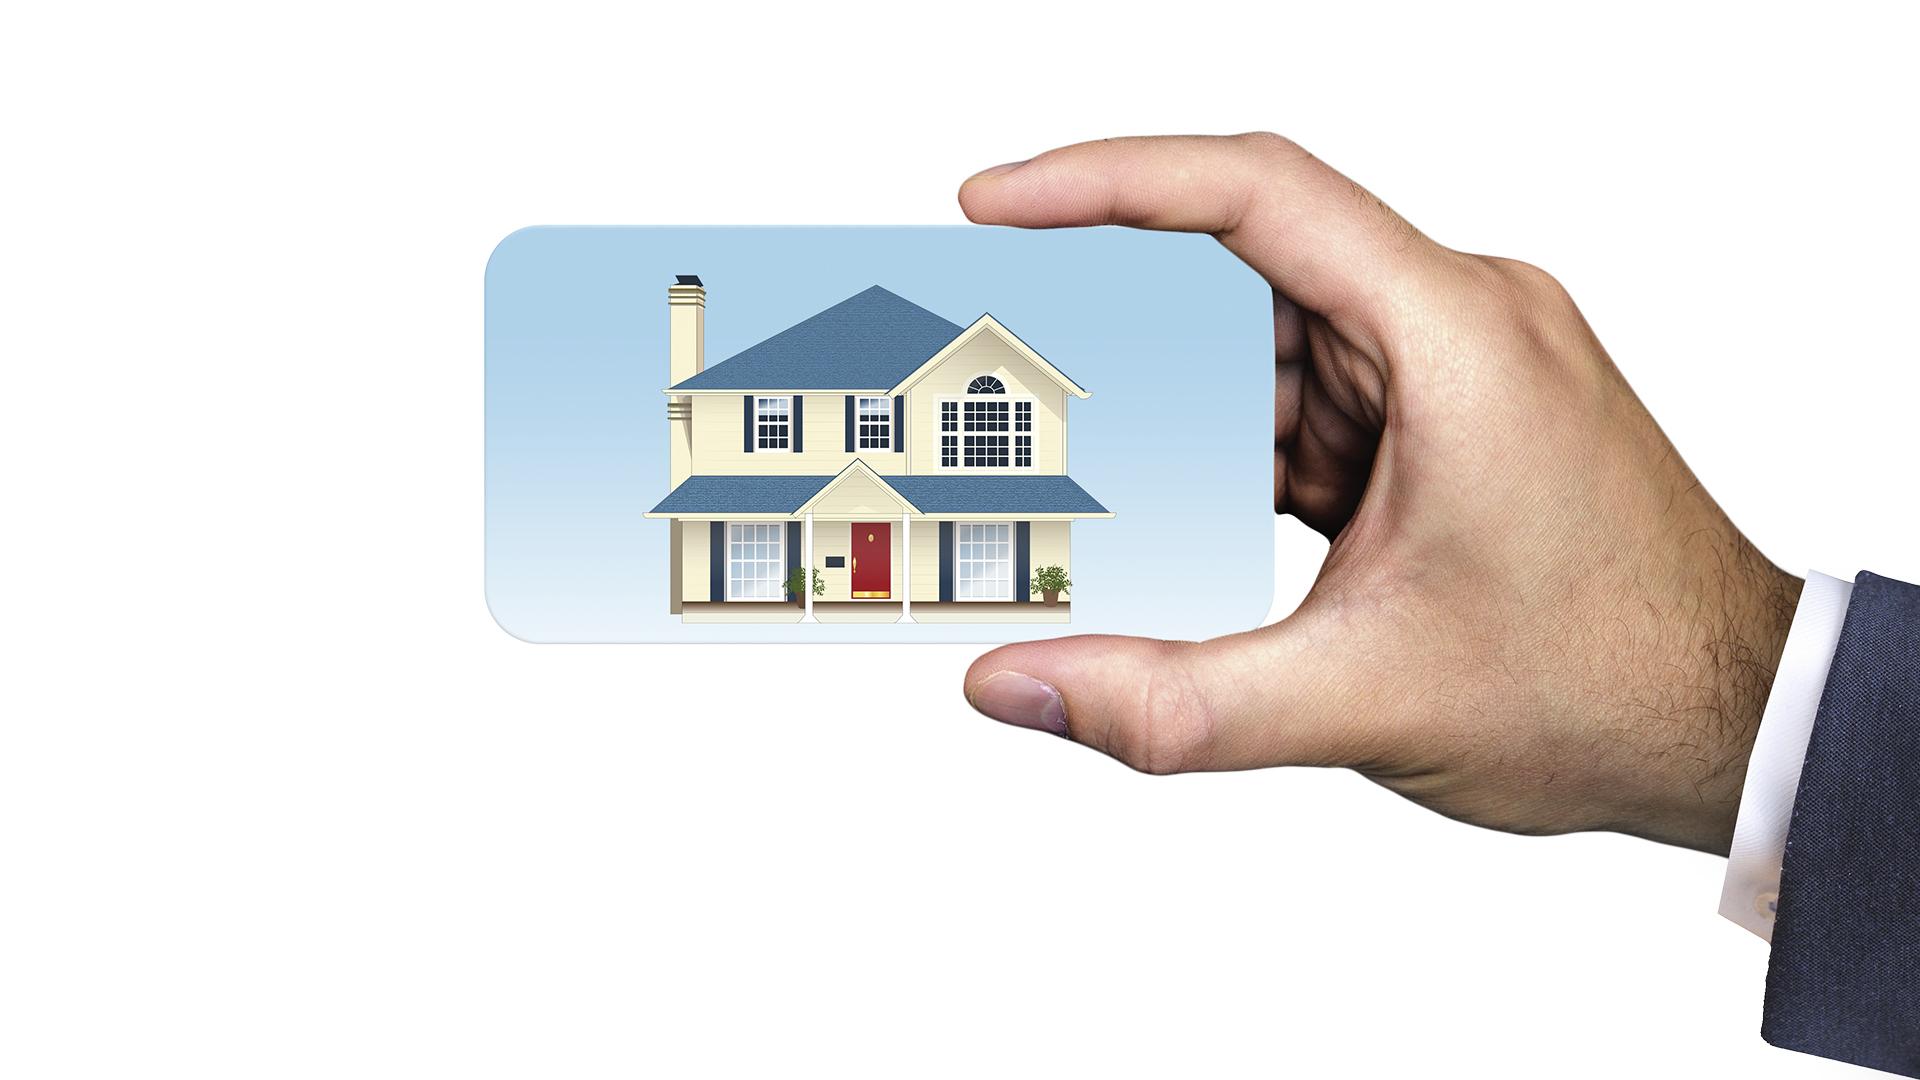 Implementing eSignatures for real estate